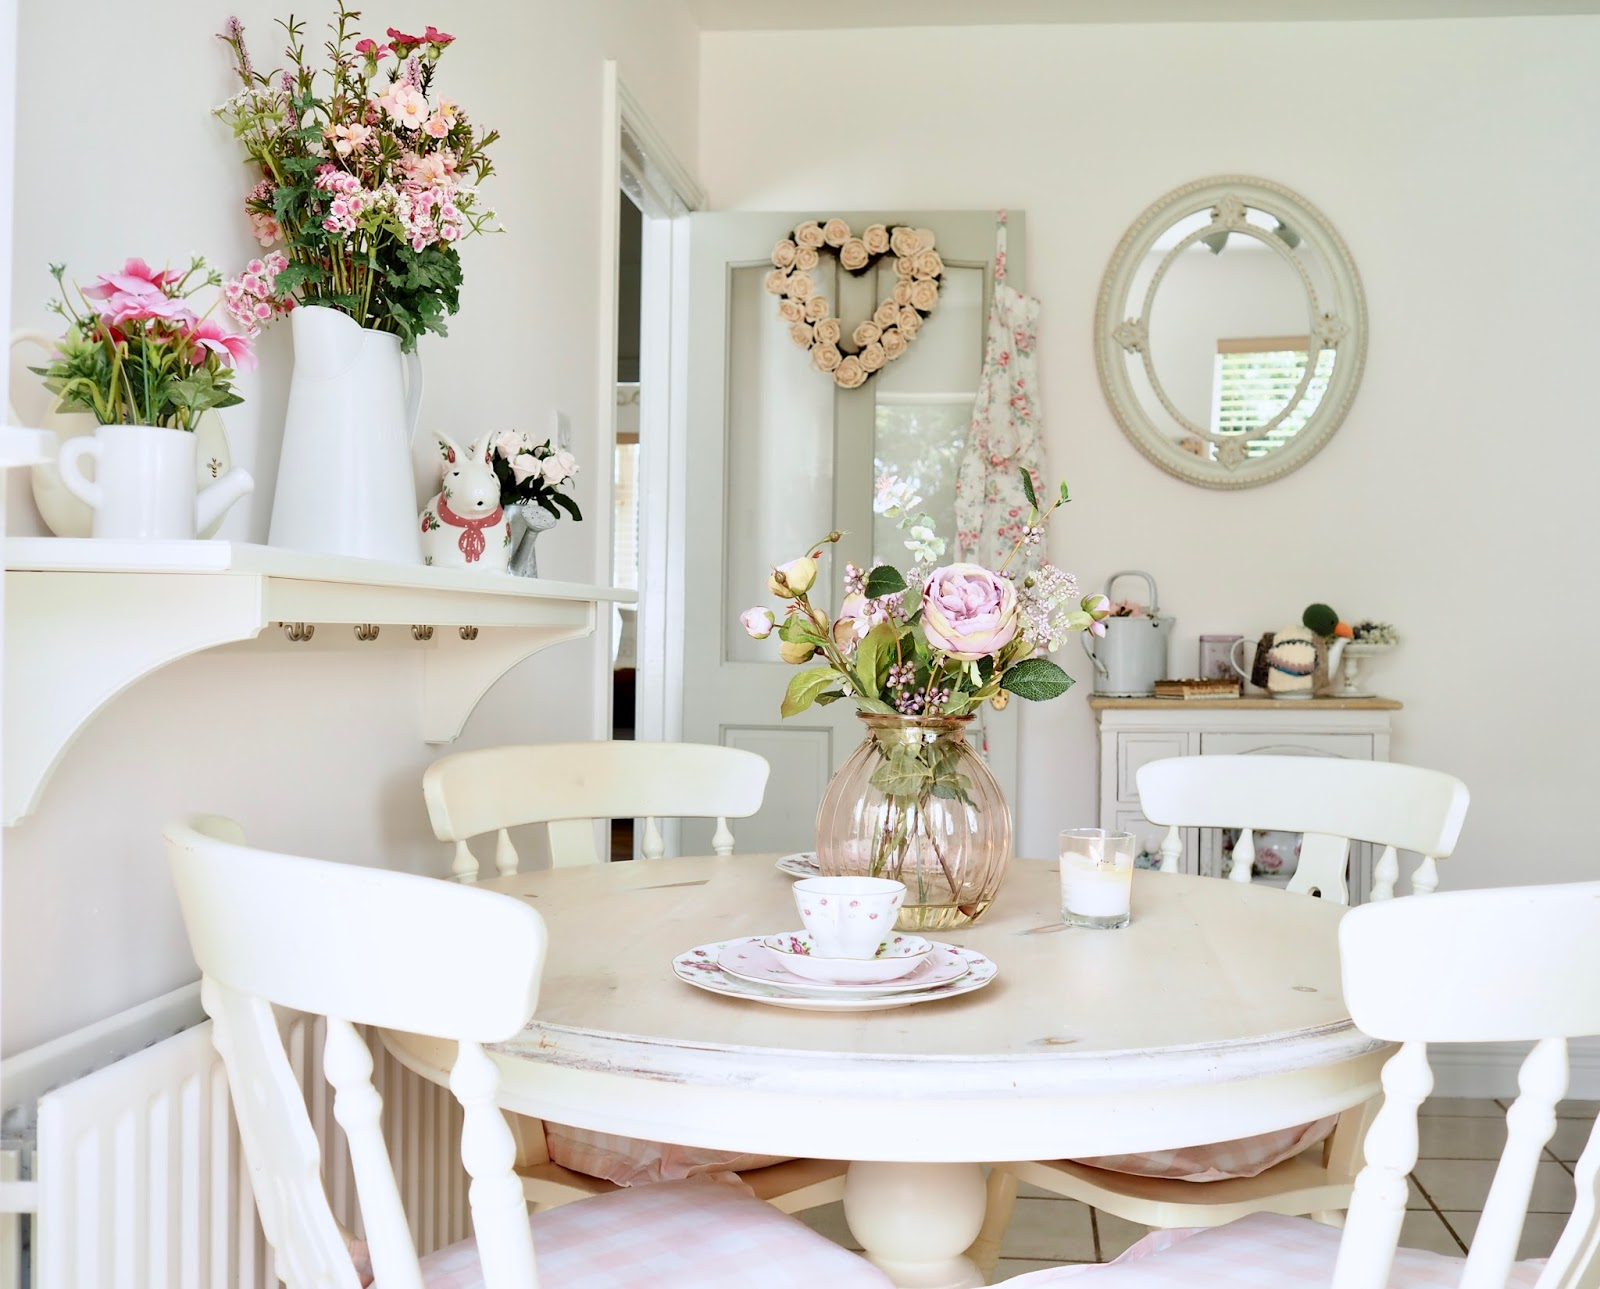 shabby chic kitchen decor kohler porcelain sink the dainty dress diaries